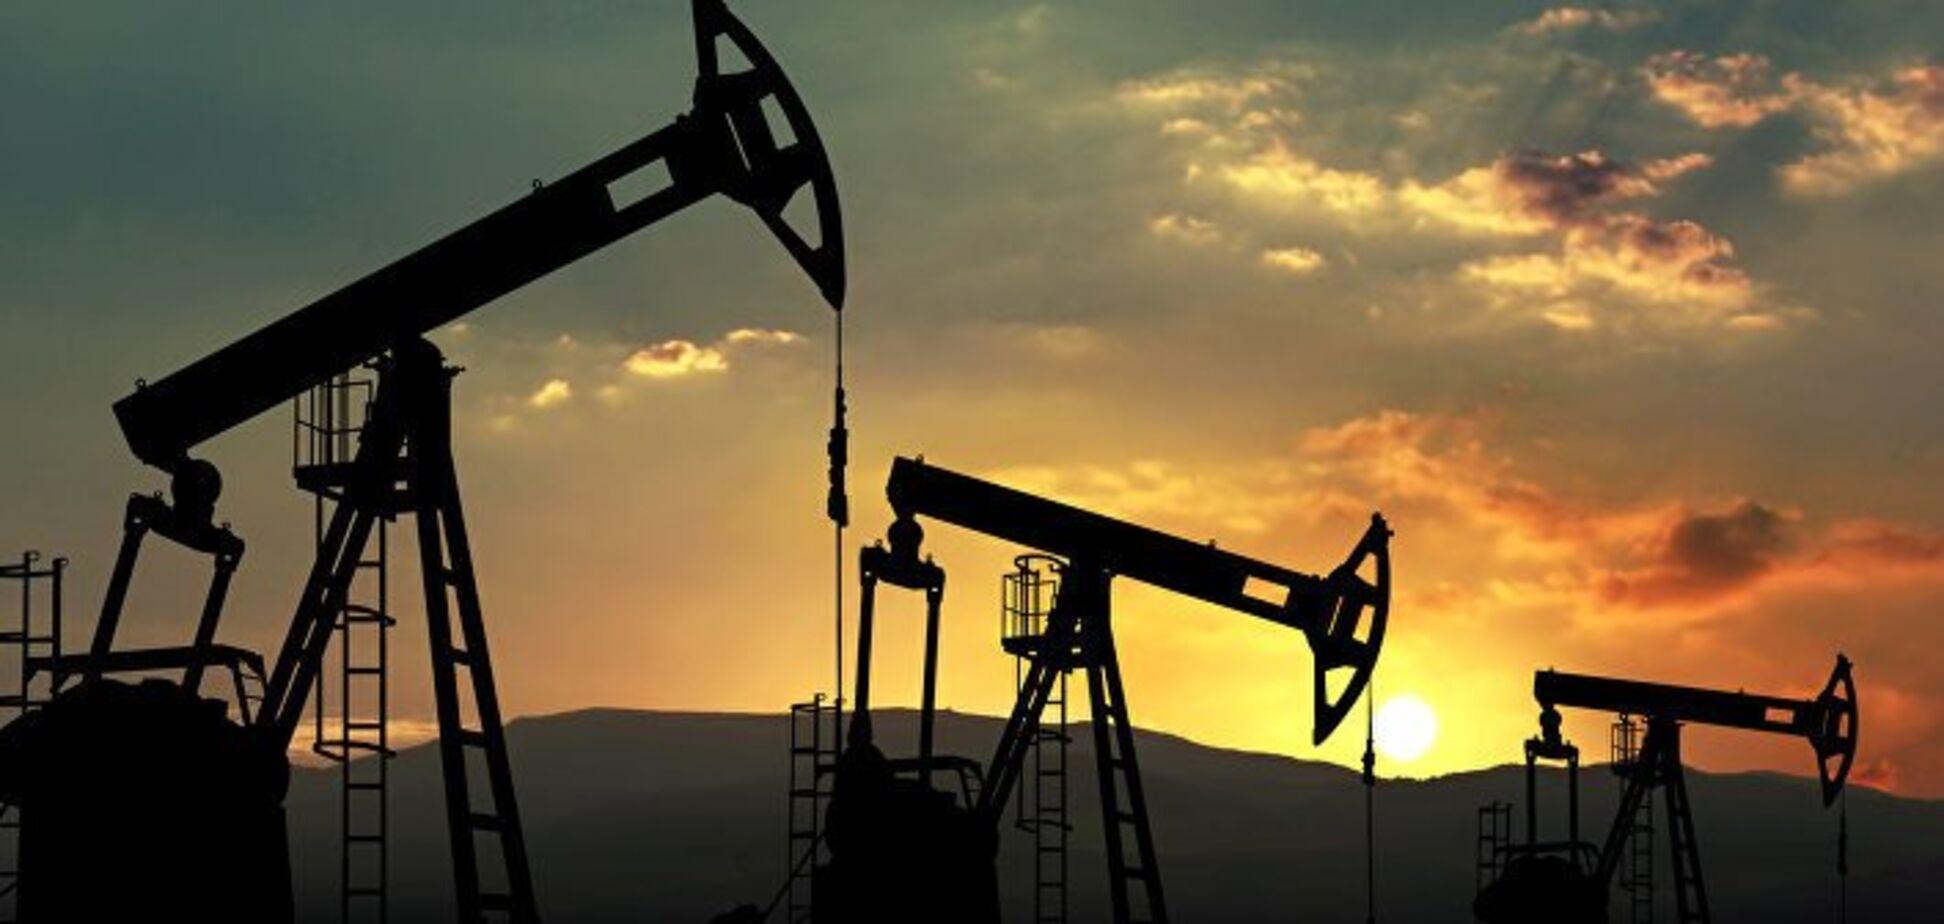 Ціна нафти пробила мінімальну позначку за рік